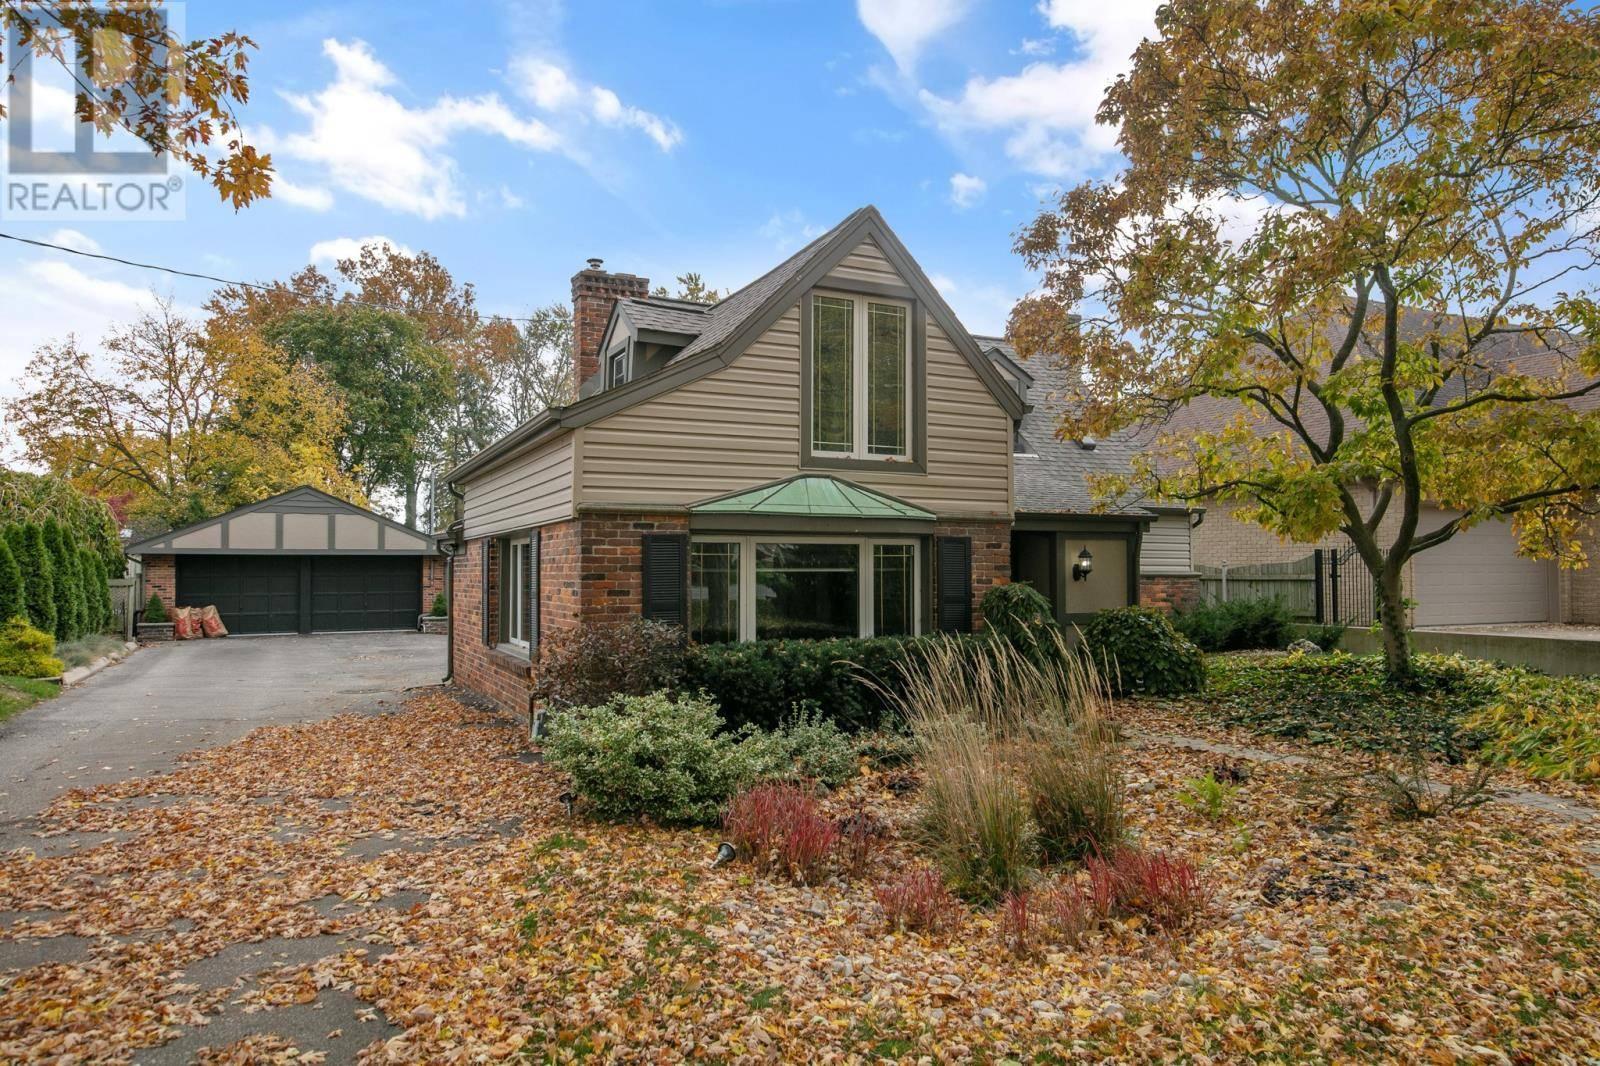 House for sale at 12479 Riverside Dr Tecumseh Ontario - MLS: 19027882